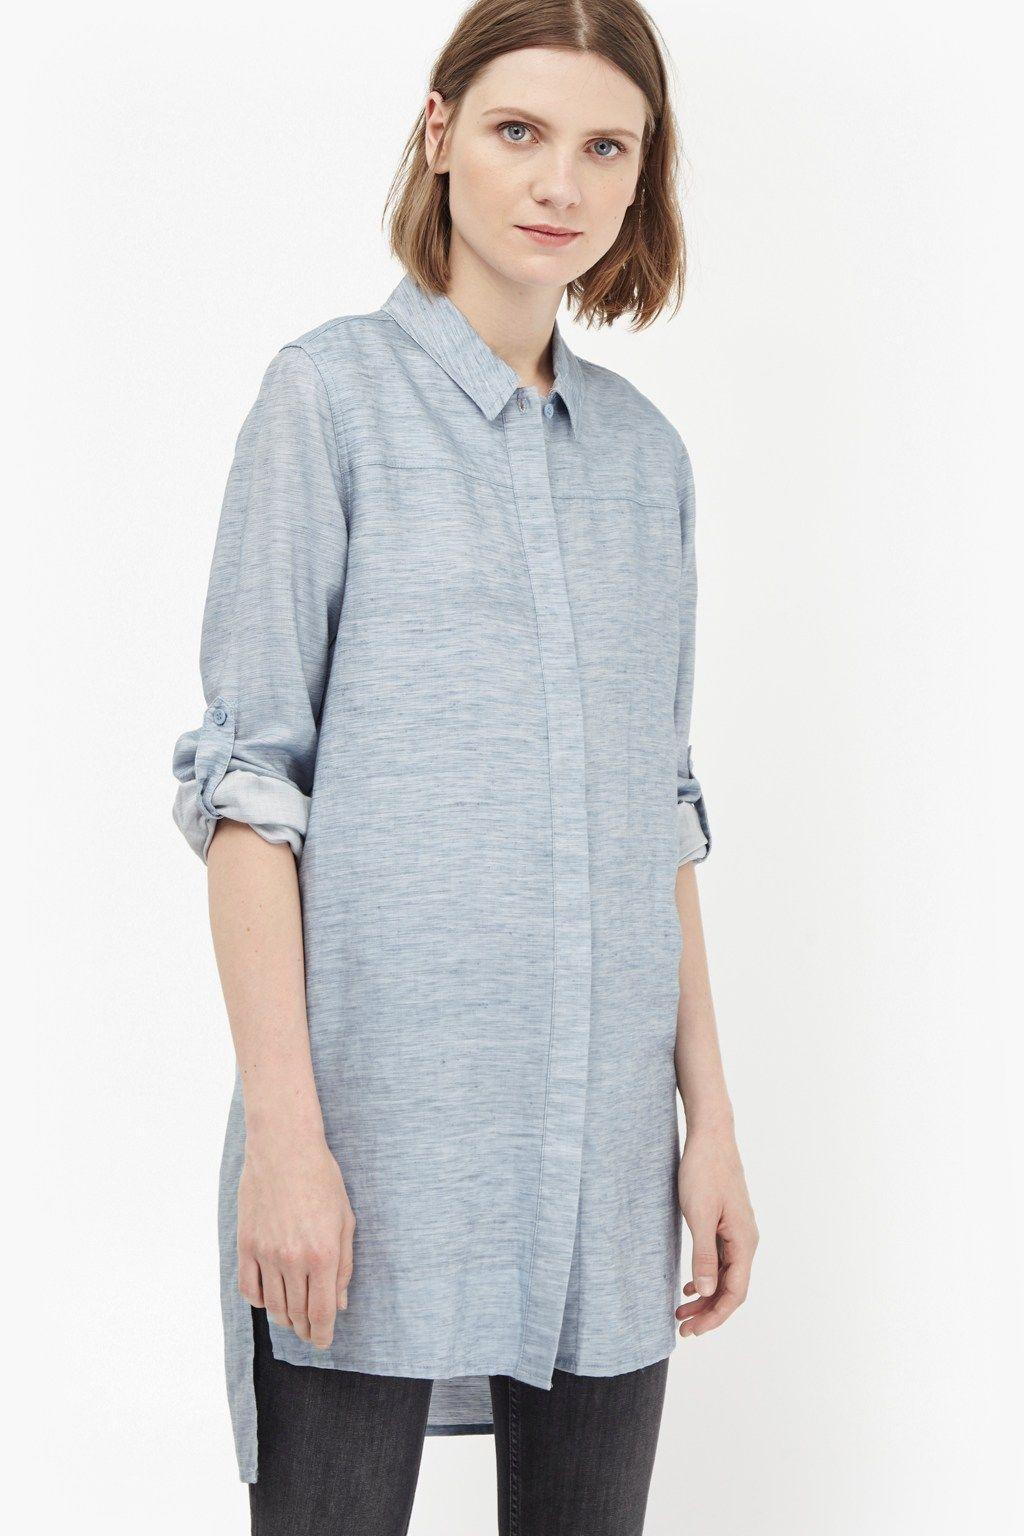 Tencel Chambray Shirt Dress   Dresses   Chambray shirt